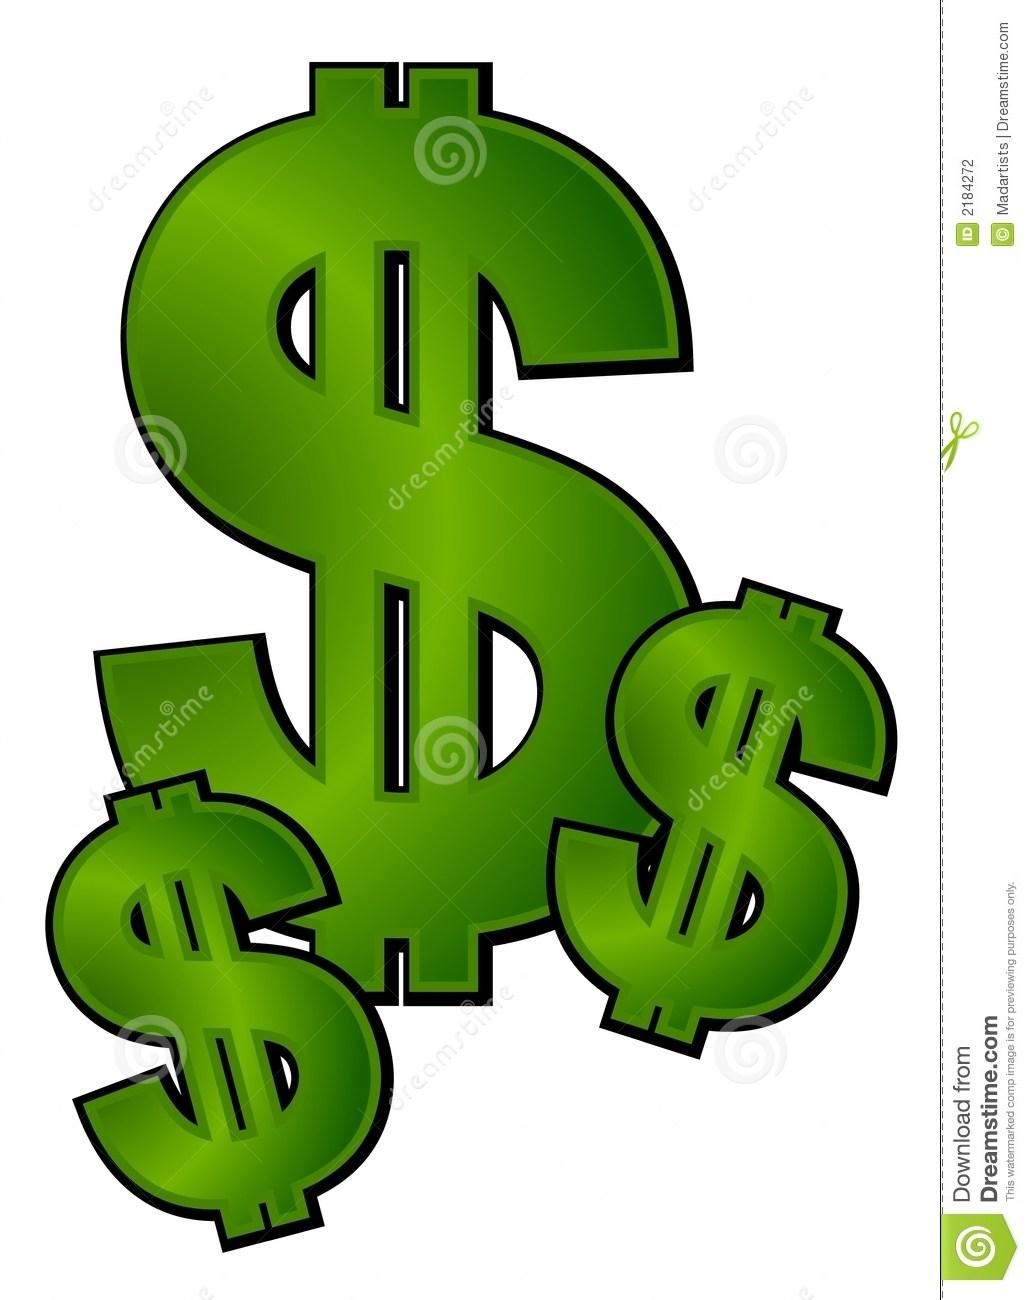 Free clipart money 6 » Clipart Portal.